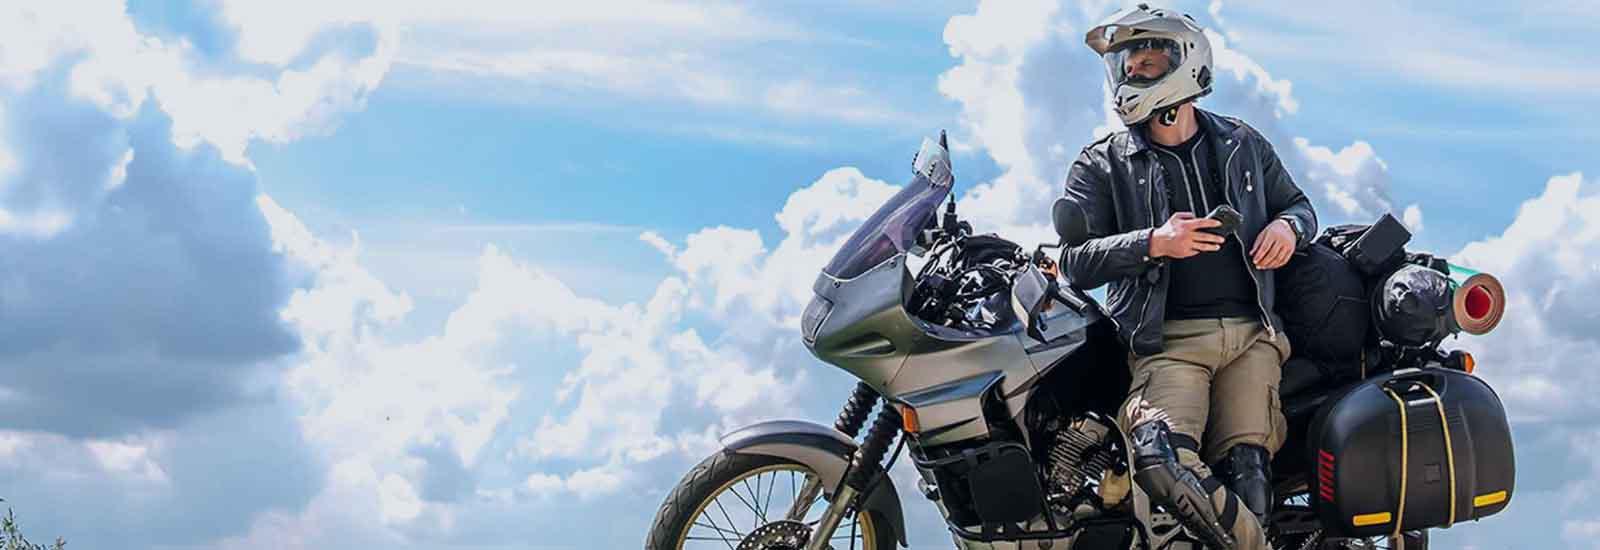 Motorcycle Insurance Houston